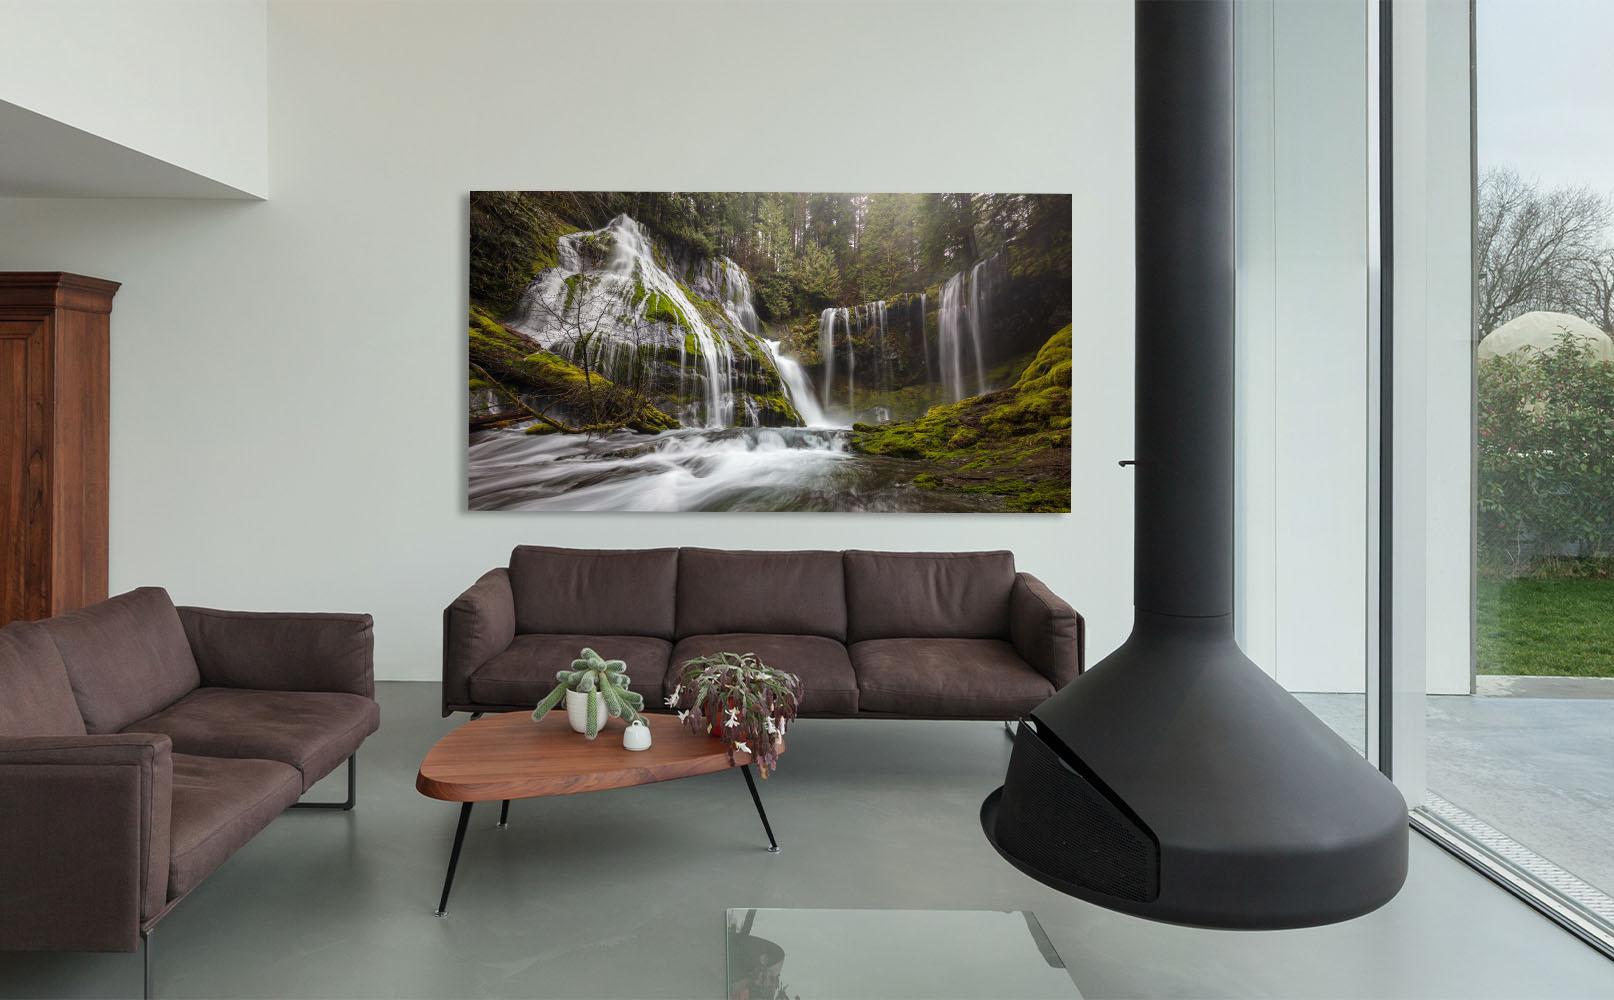 Washington Fine Art Waterfall Forest river creek Luxury Home Decor Artwork Bliss Michael Andrejkow